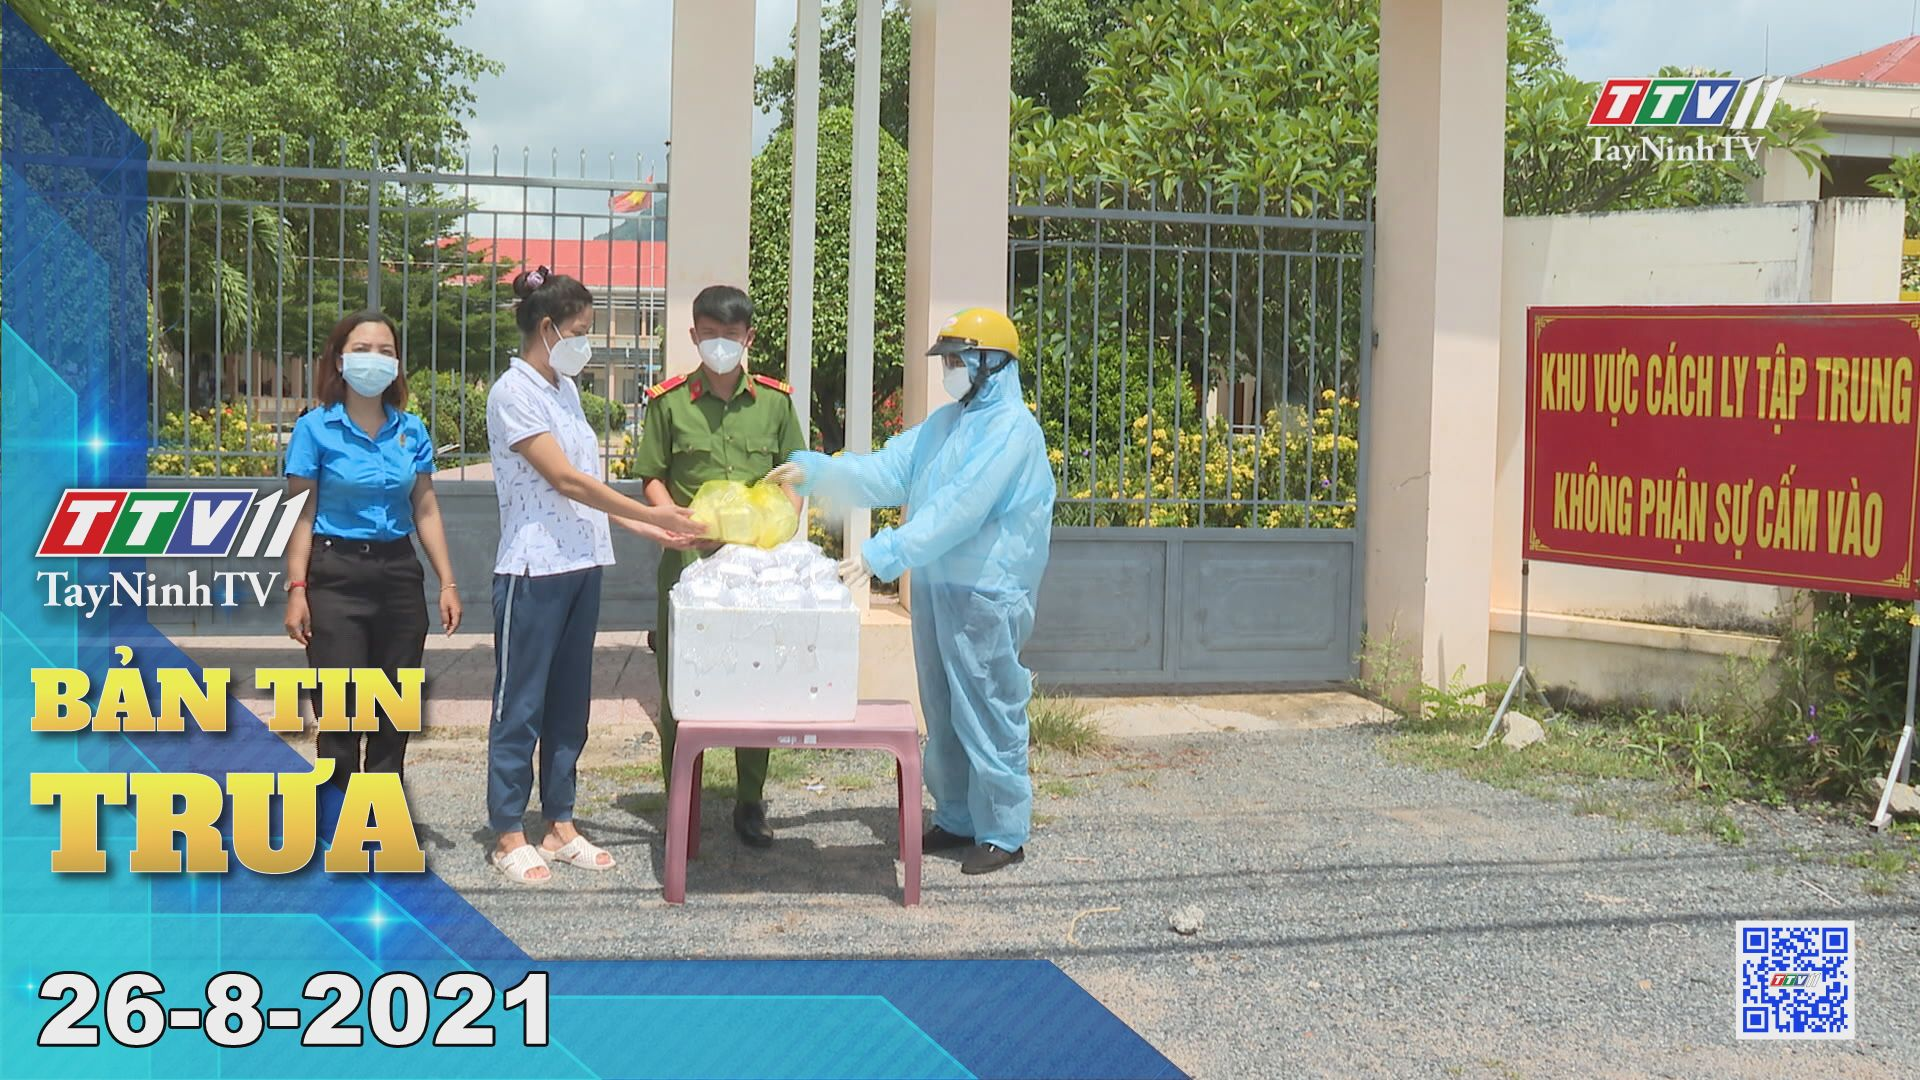 Bản tin trưa 26-8-2021 | Tin tức hôm nay | TayNinhTV